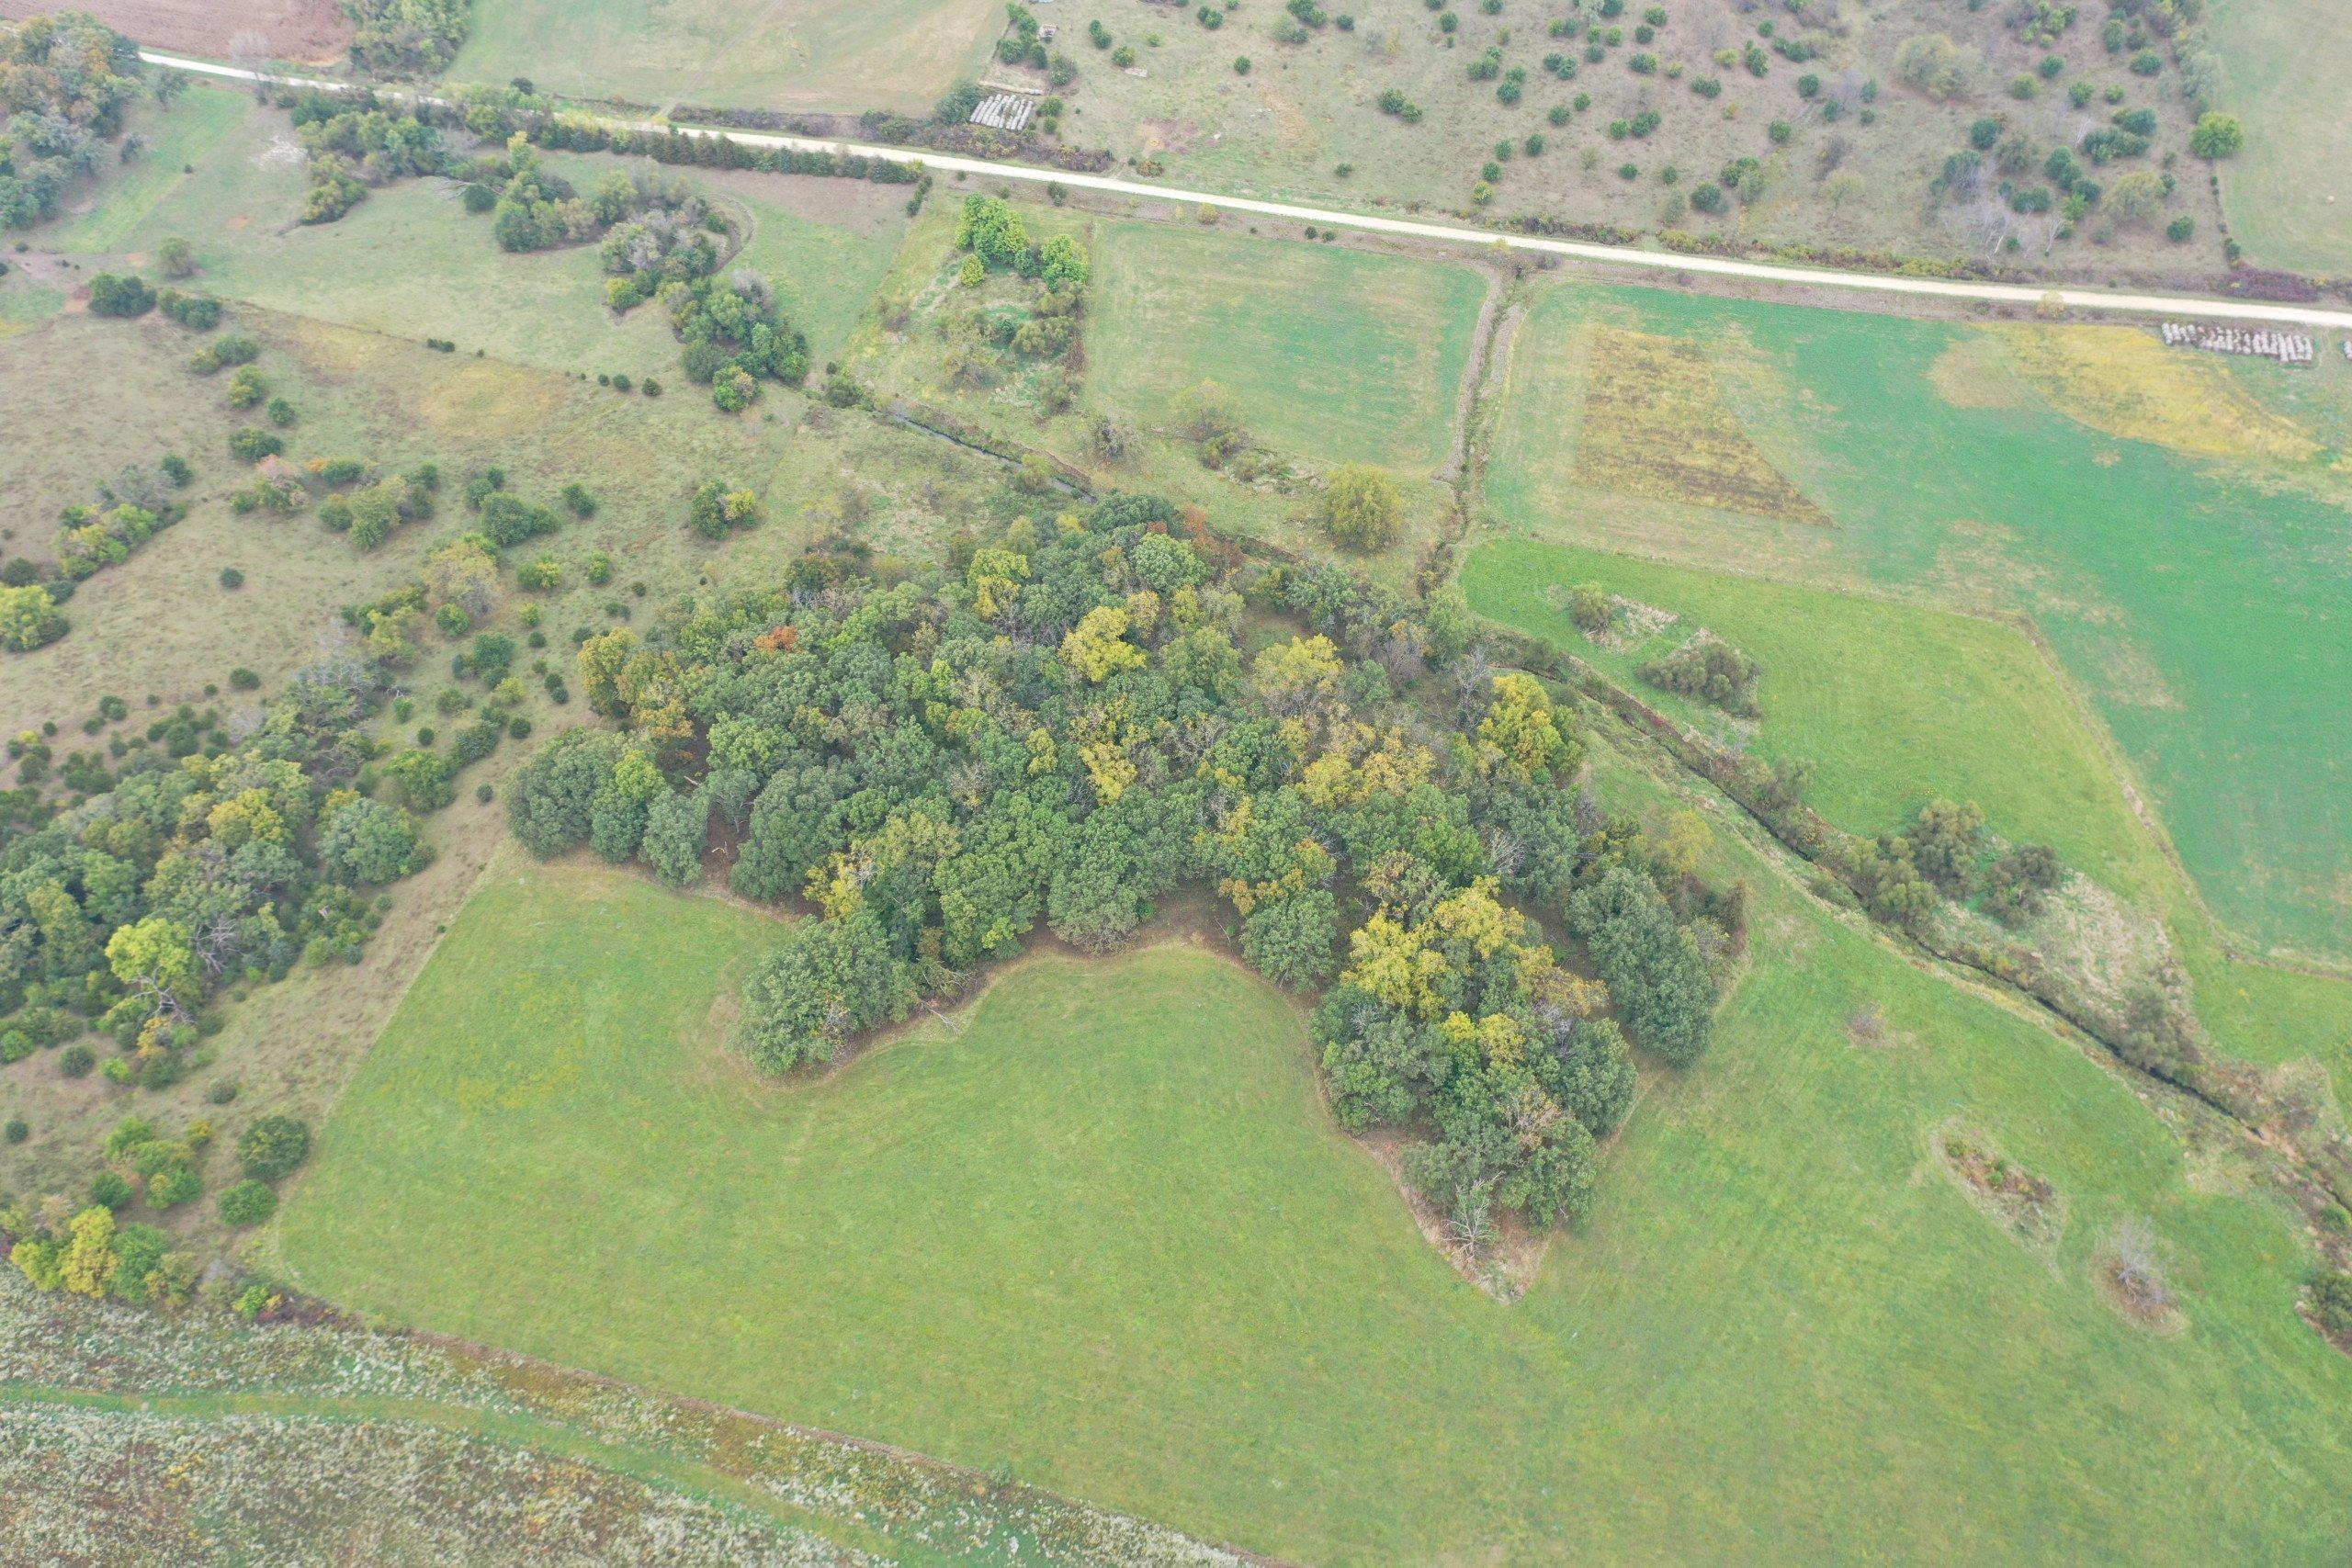 land-warren-county-iowa-200-acres-listing-number-15810-DJI_0609-3.jpg